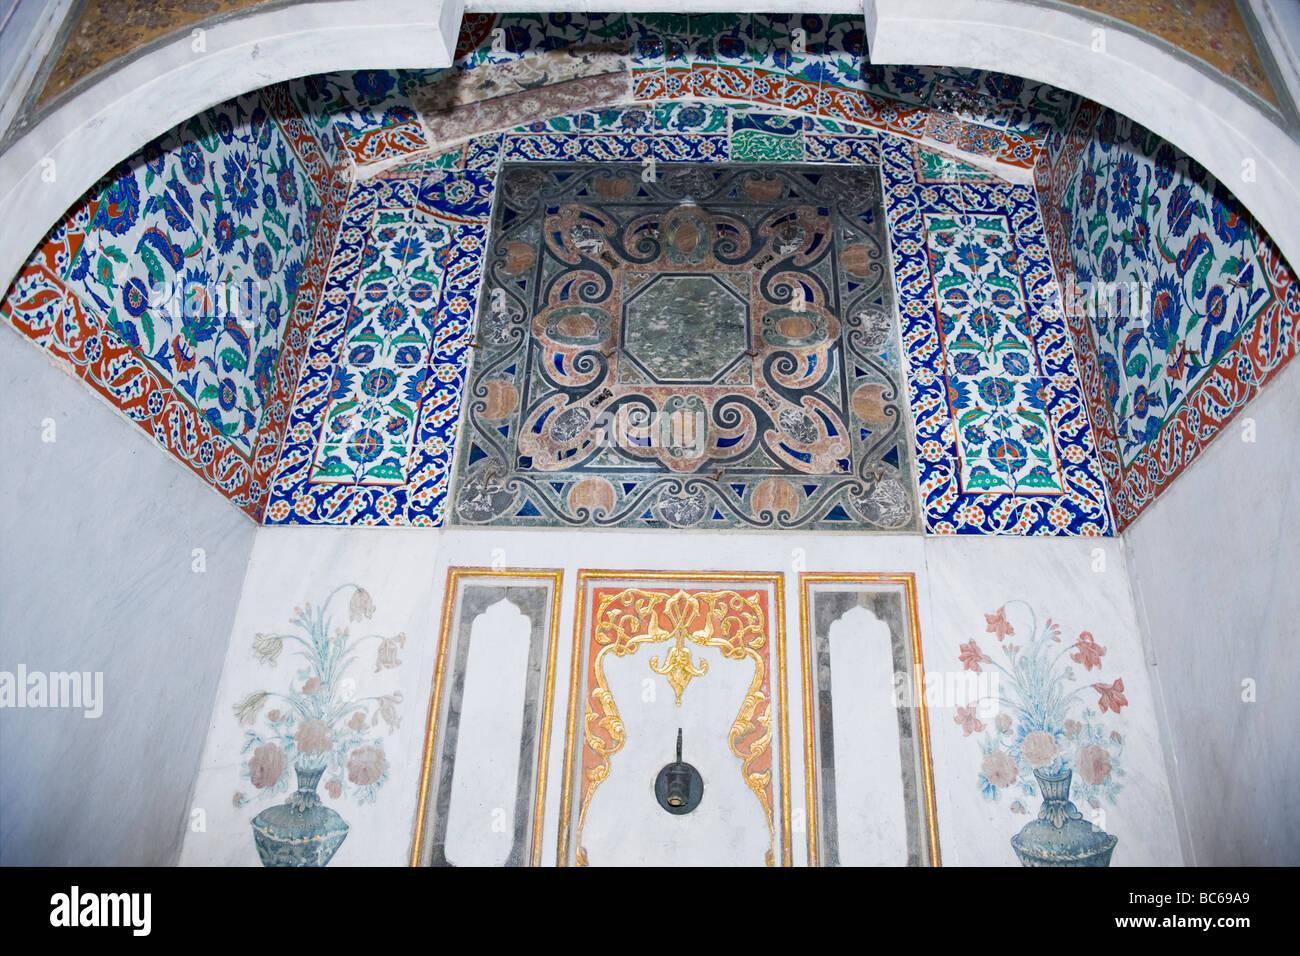 Turkey , Istanbul , Topkapi Palace , Wall Detail In Sultanu0027s Bathroom In  Harem Magnificent Blue Tiles Pattern U0026 Murals